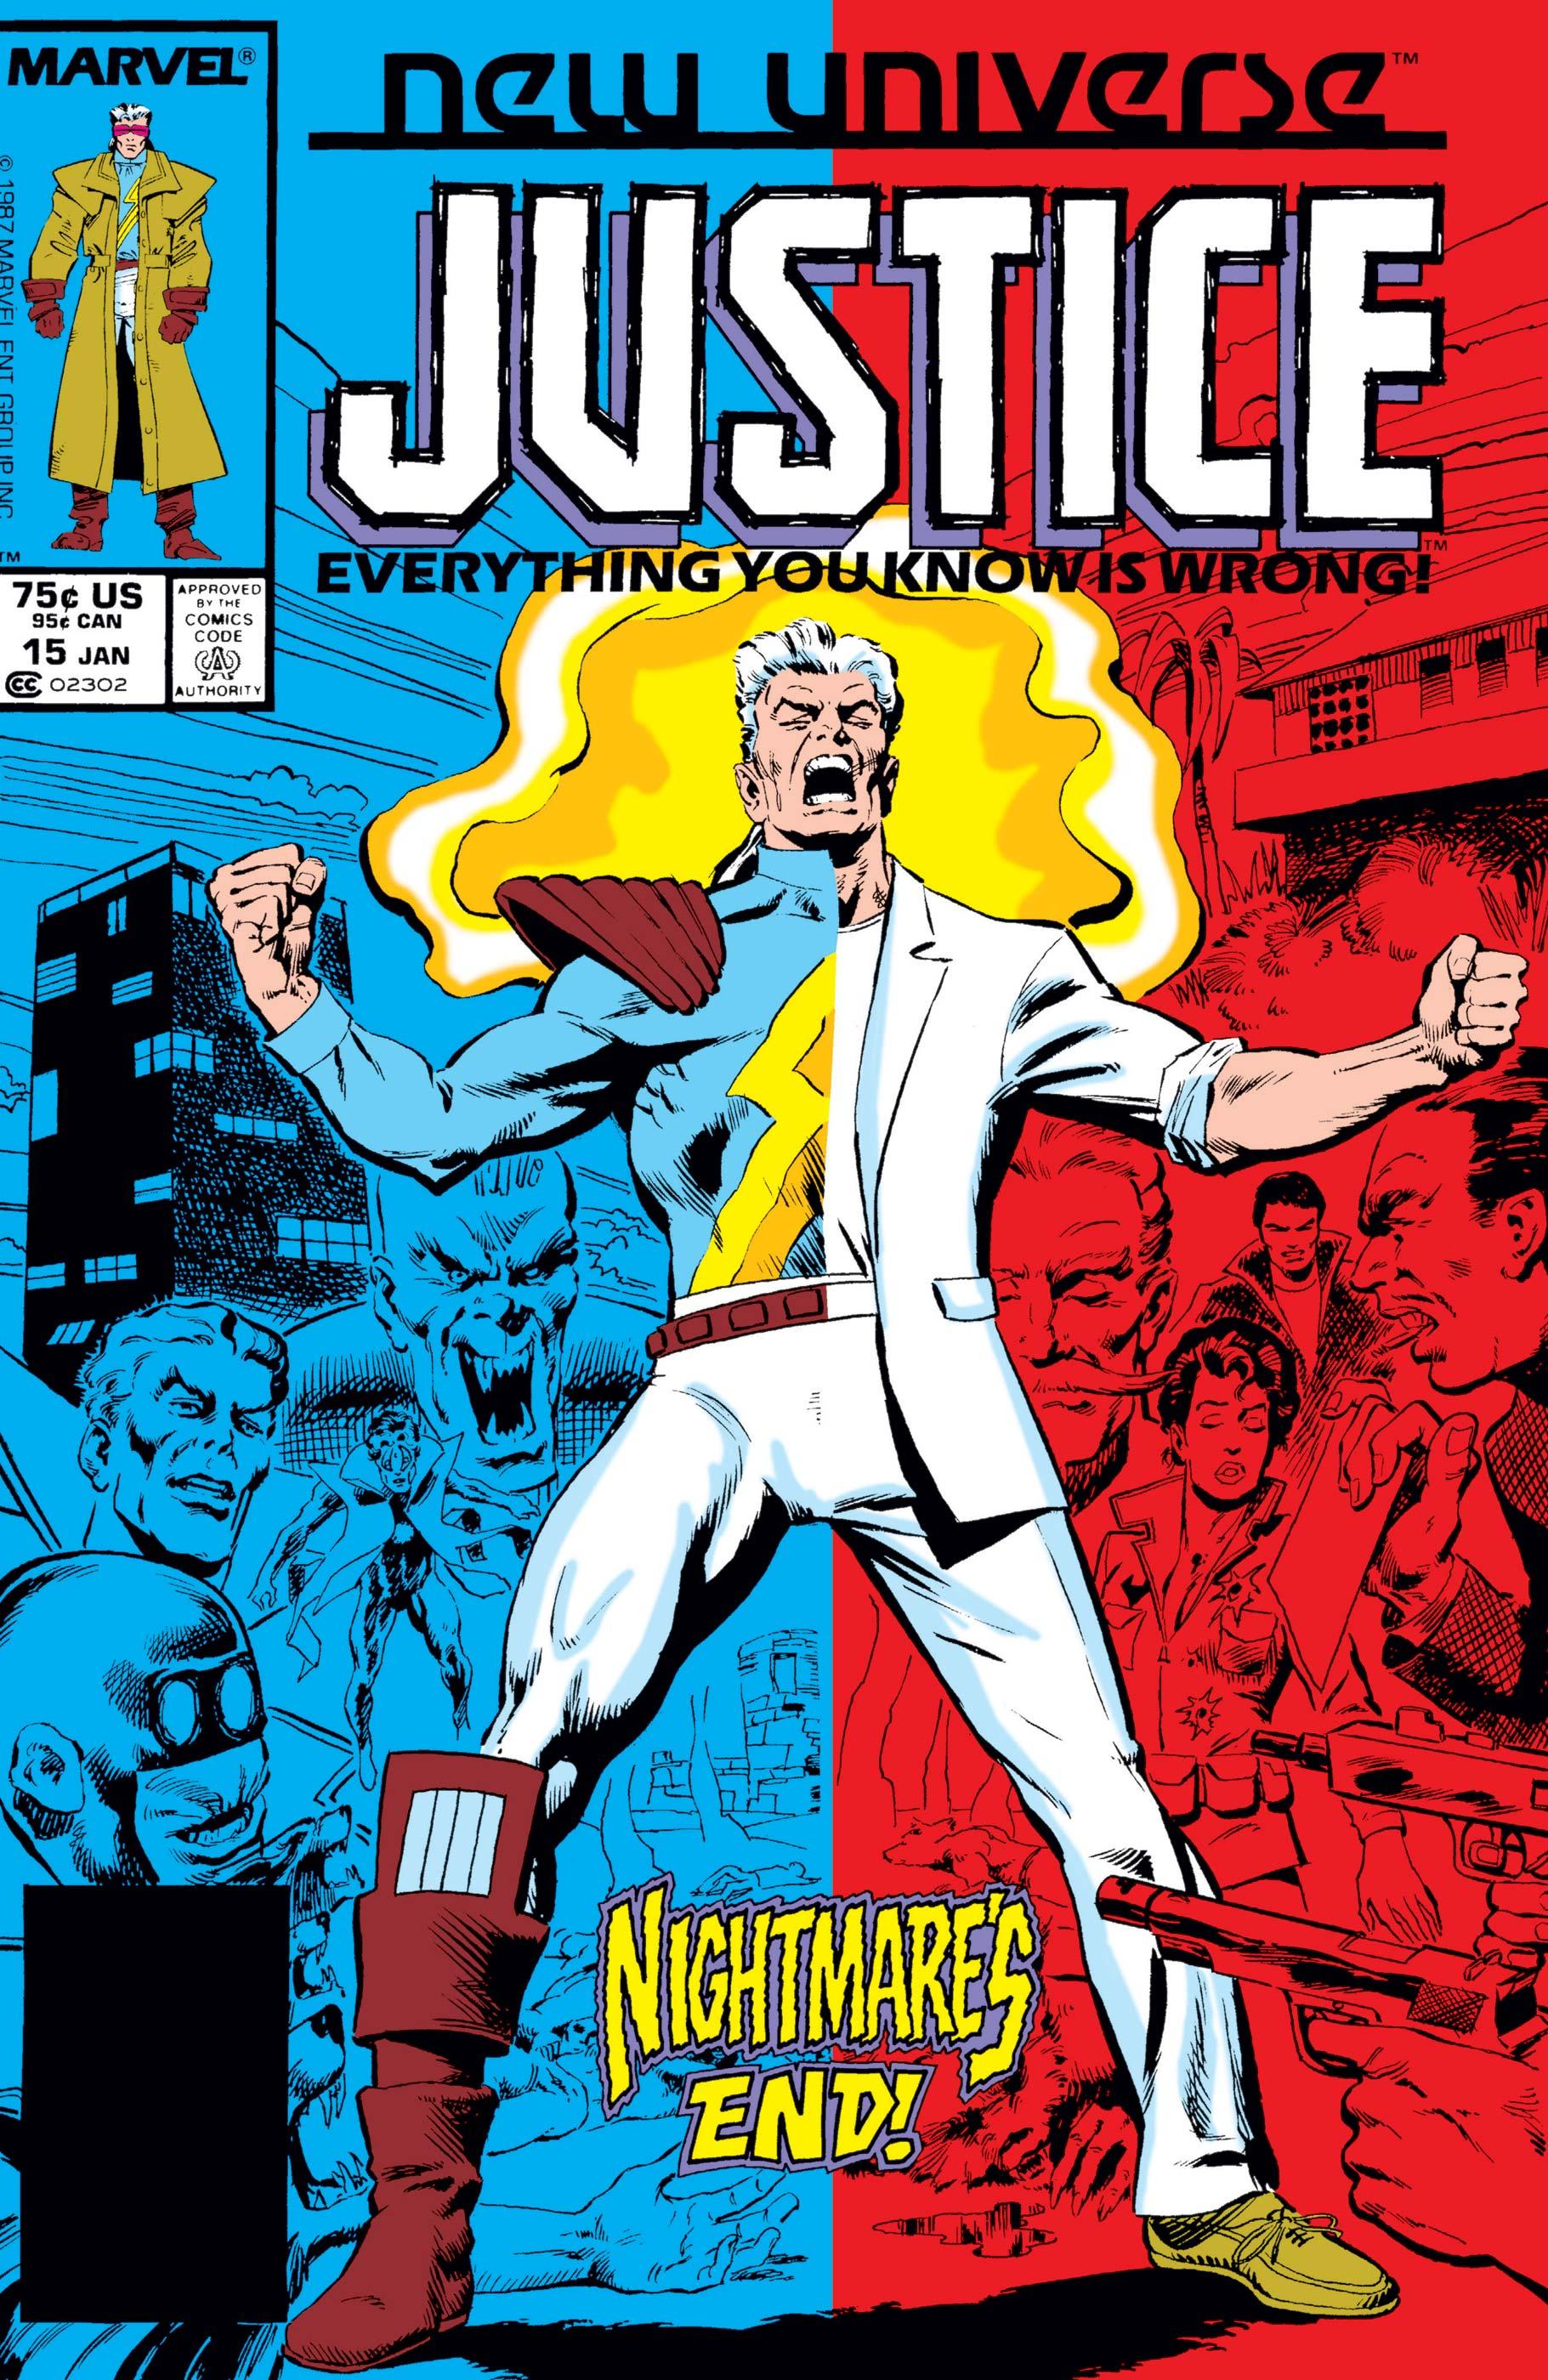 Justice (1986) #15